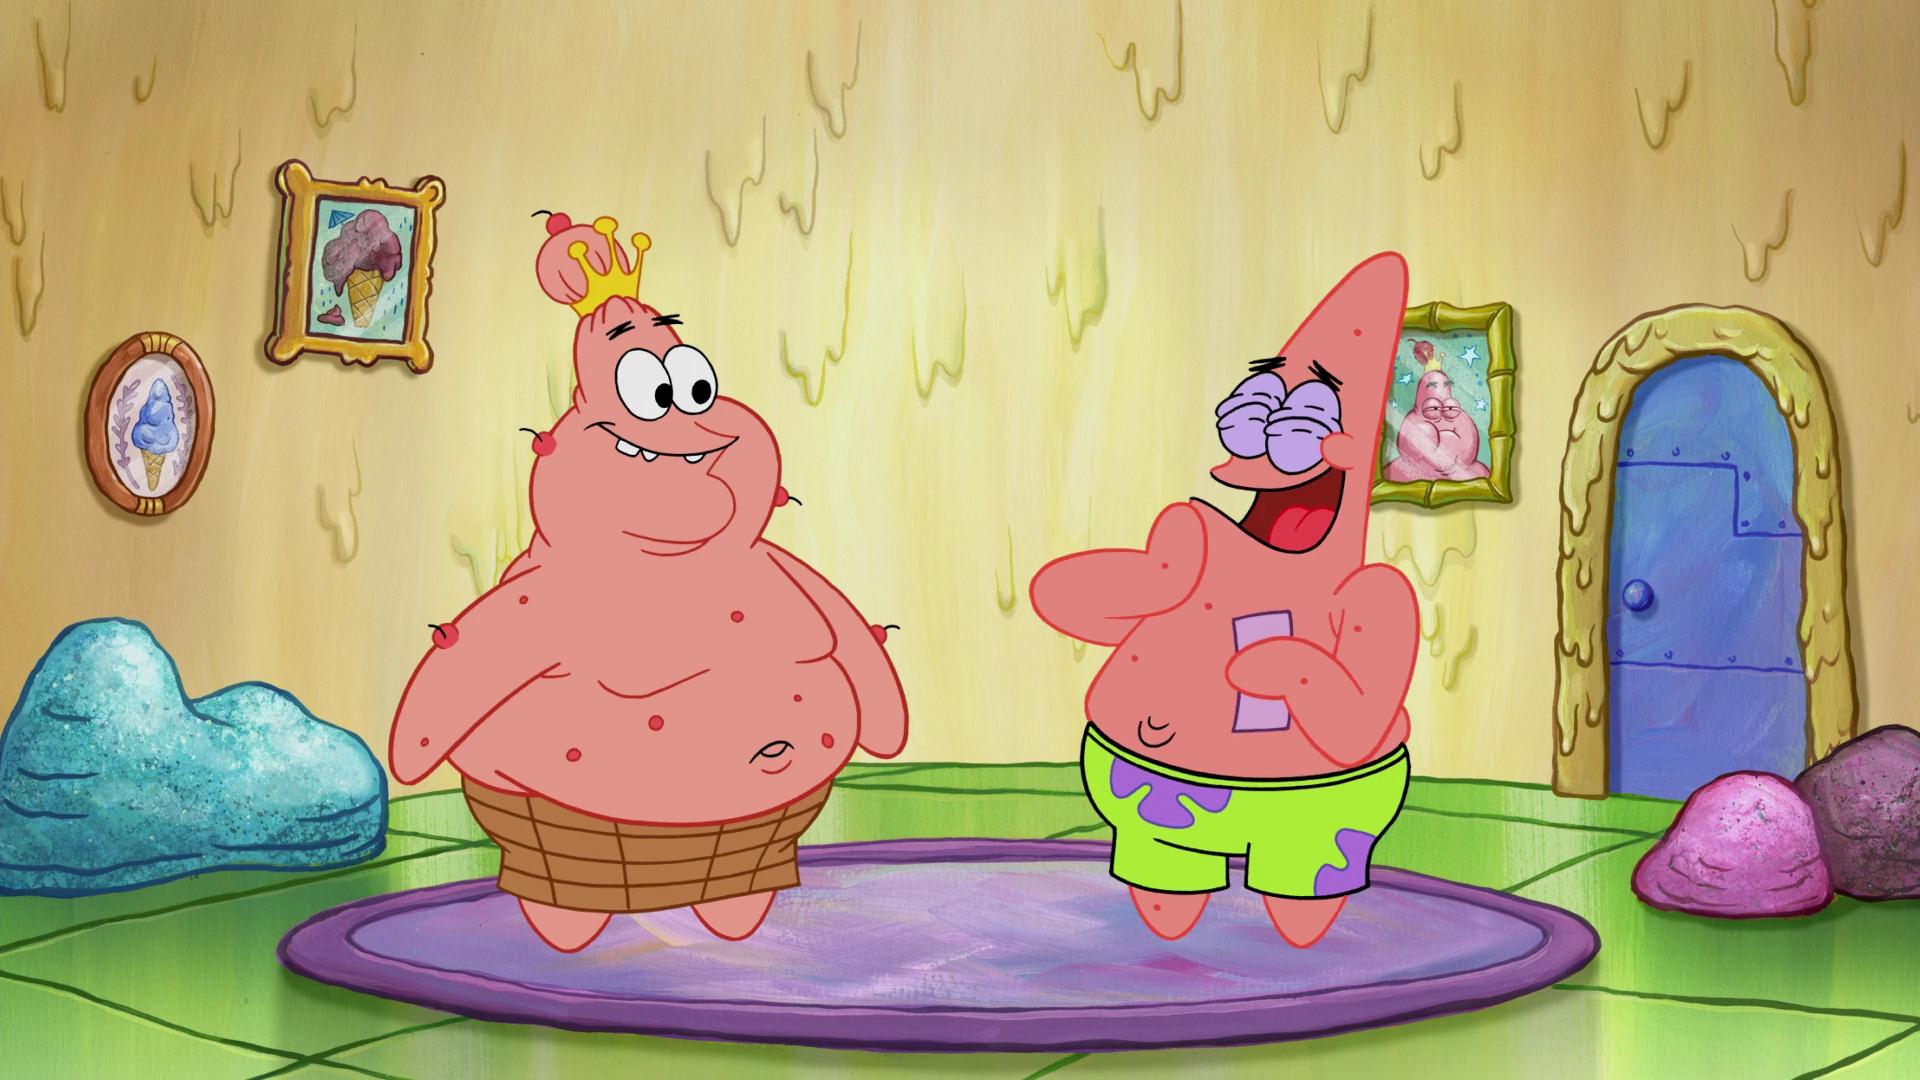 Spongebob nudepics Nude Photos 9